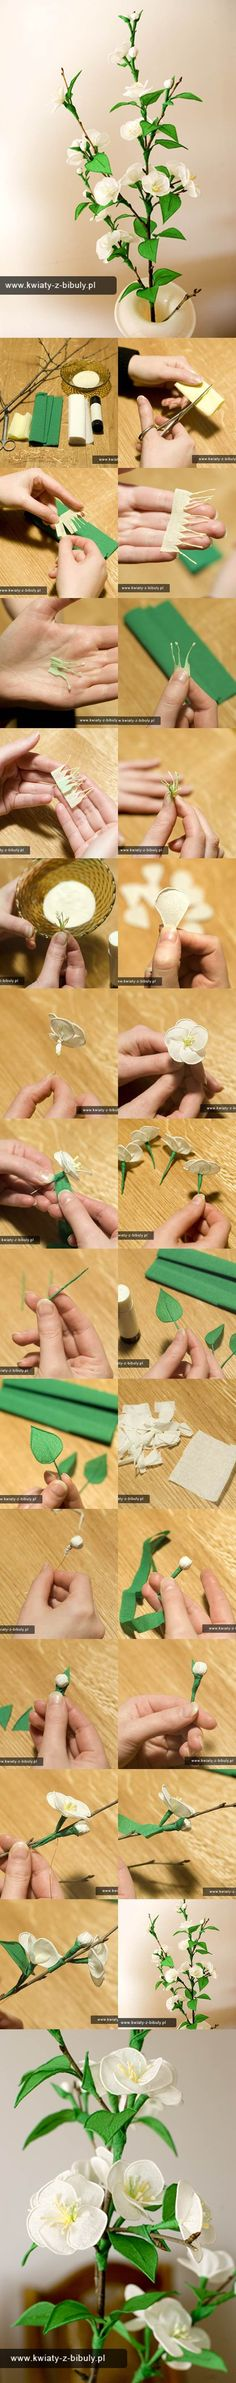 DIY Delicate Crepe Paper Cherry Blossom Sprig | iCreativeIdeas.com Follow Us on Facebook --> https://www.facebook.com/icreativeideas